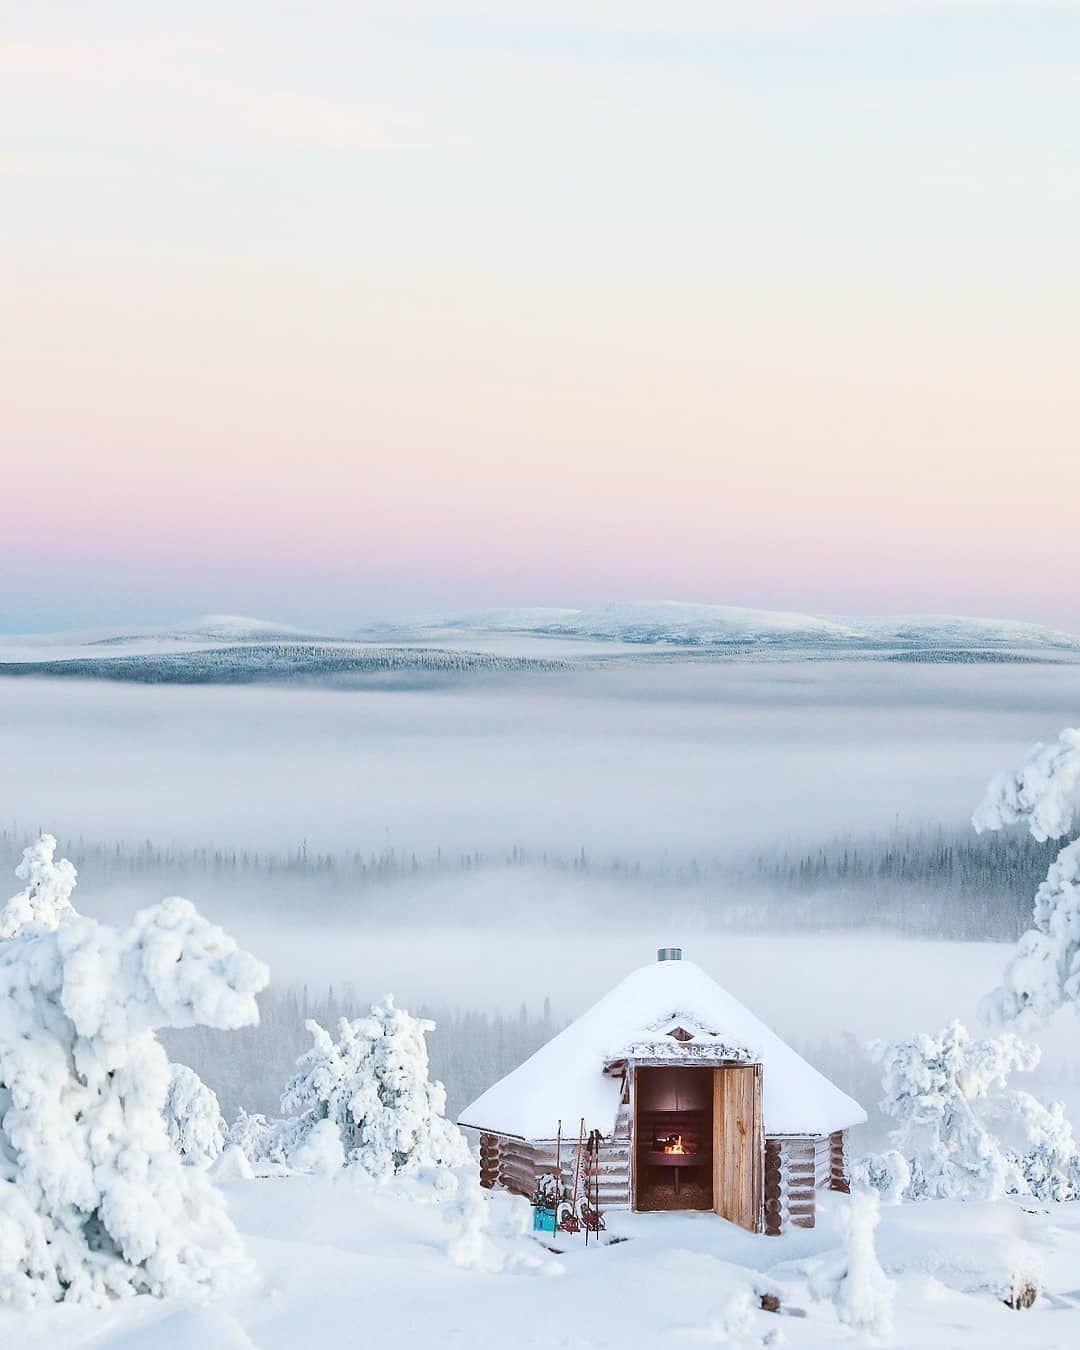 4 032 Tykkaysta 32 Kommenttia The Best Of Finland Thebestoffinland Instagramissa The Best Of Finland Feature Log Cabin Homes Cabin Cabin Homes